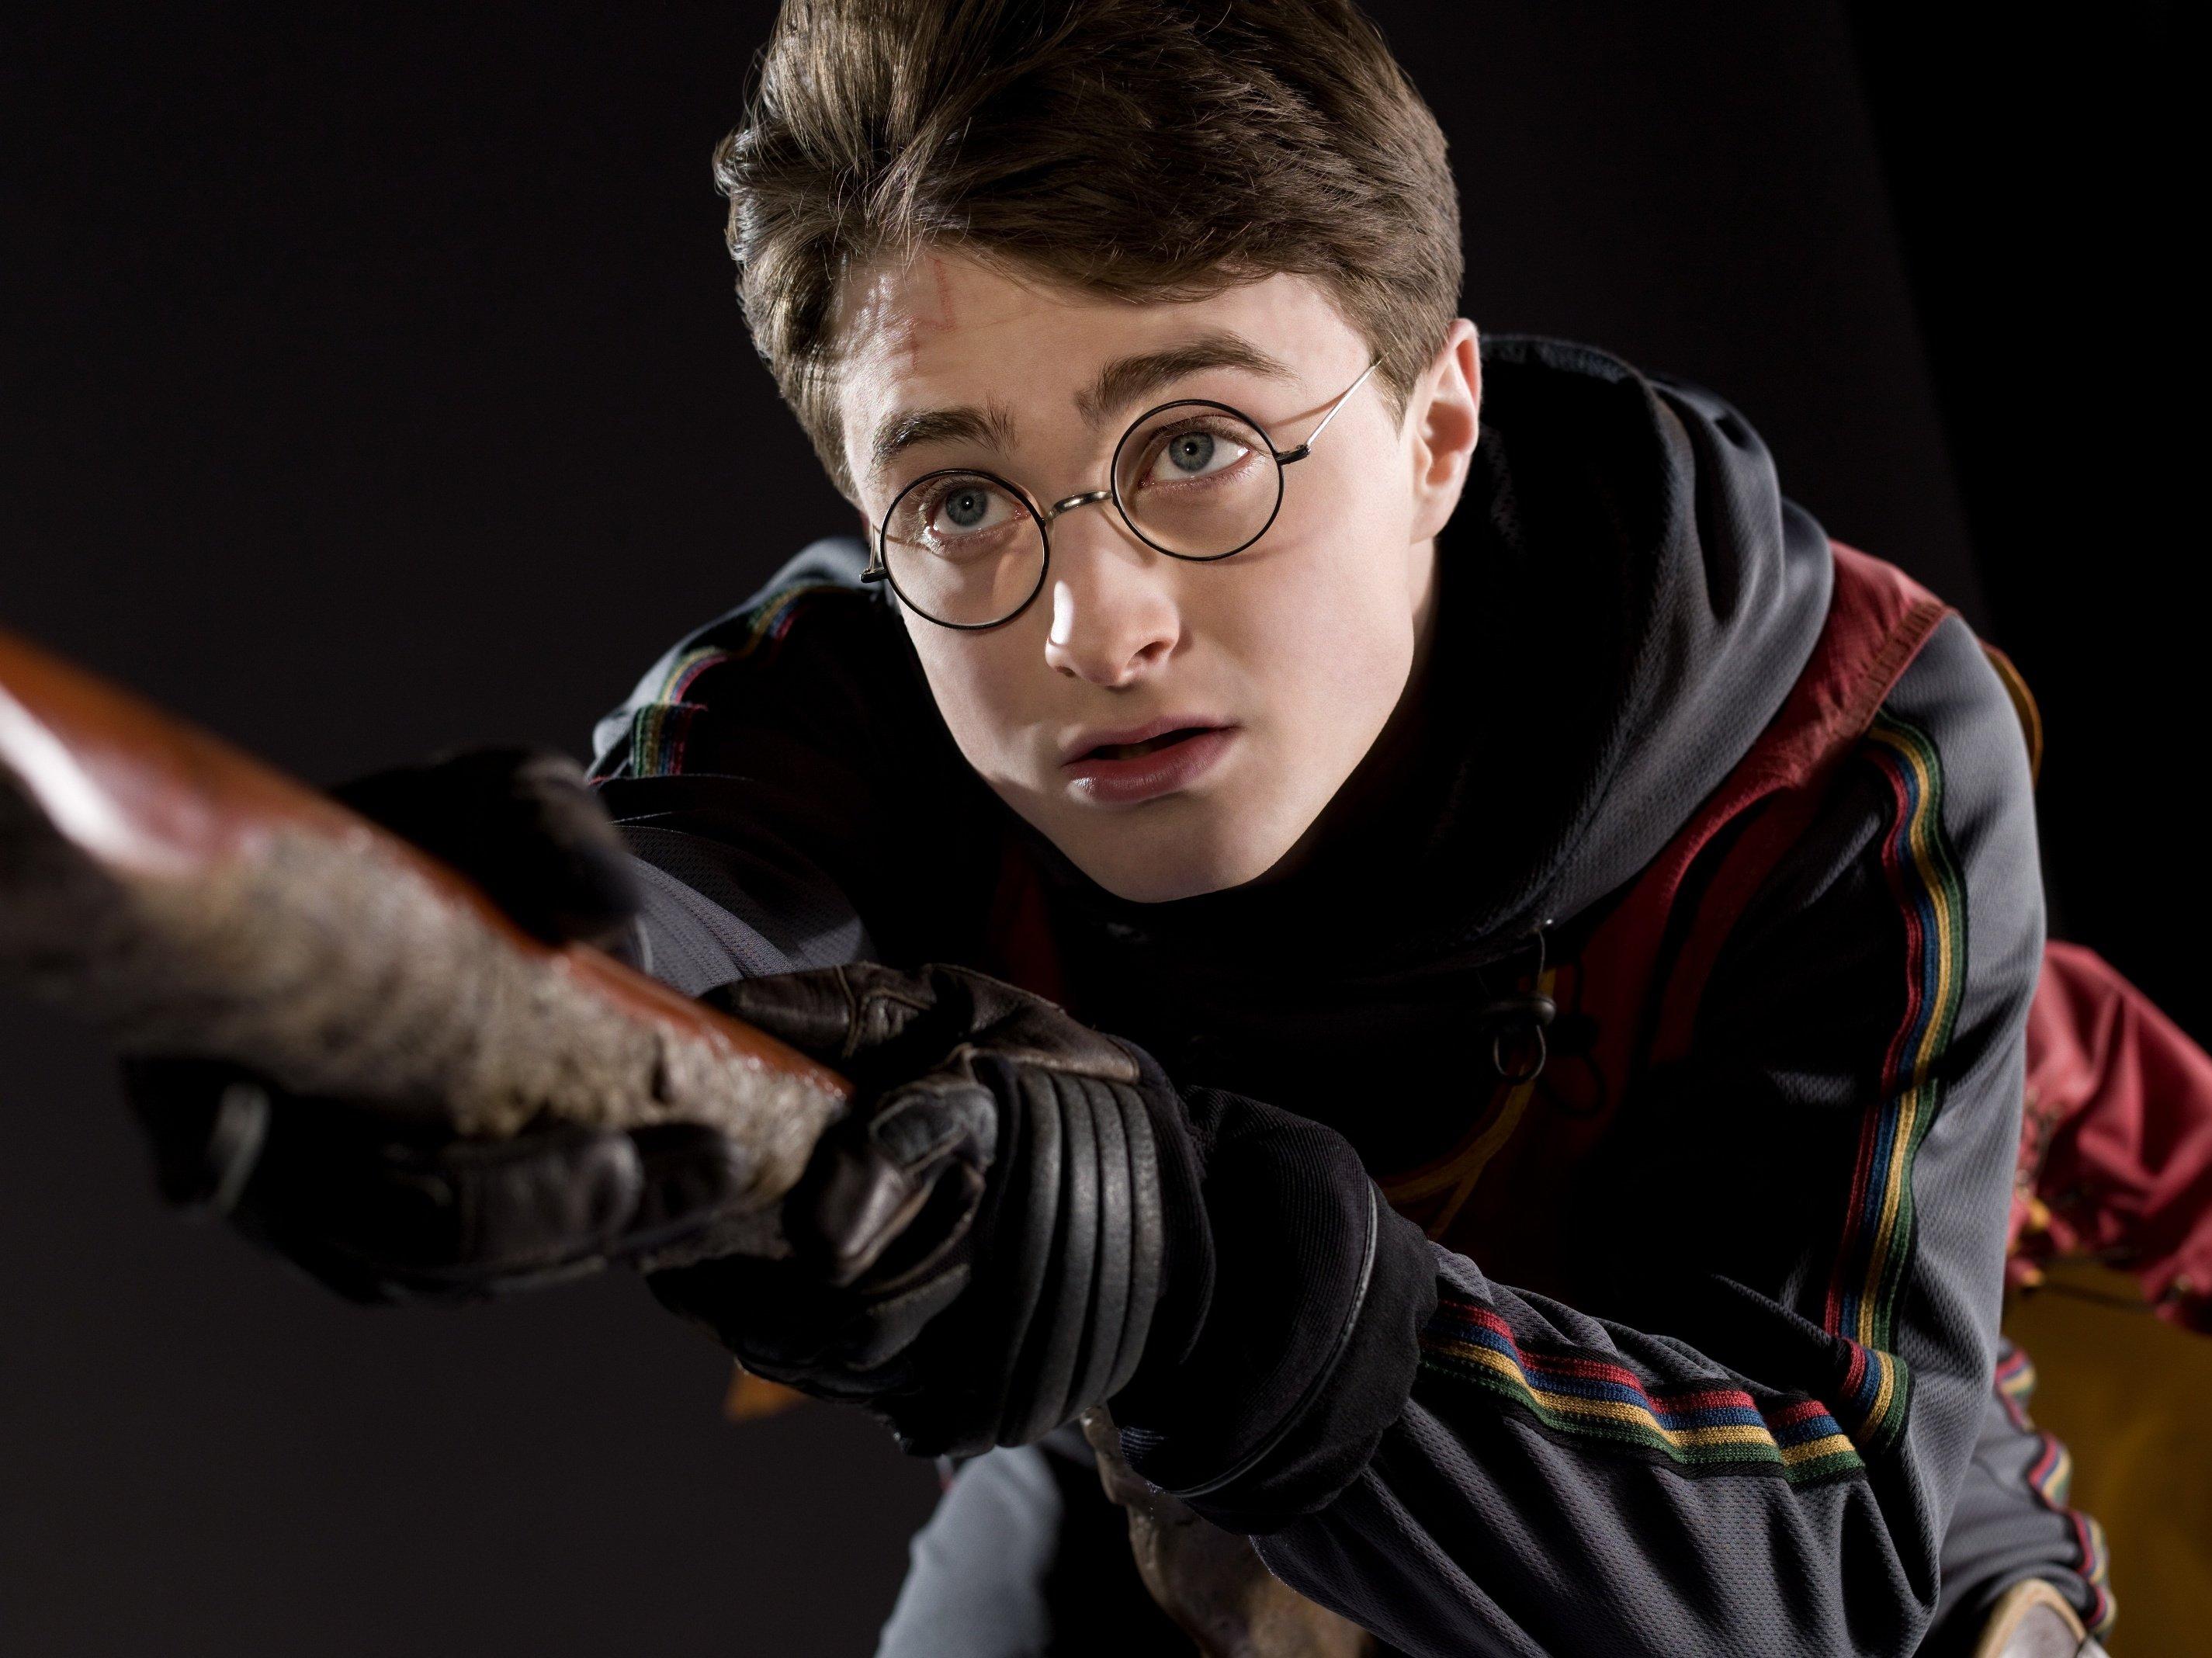 Harry_Potter_-_Quidditch_HBP_promo_2